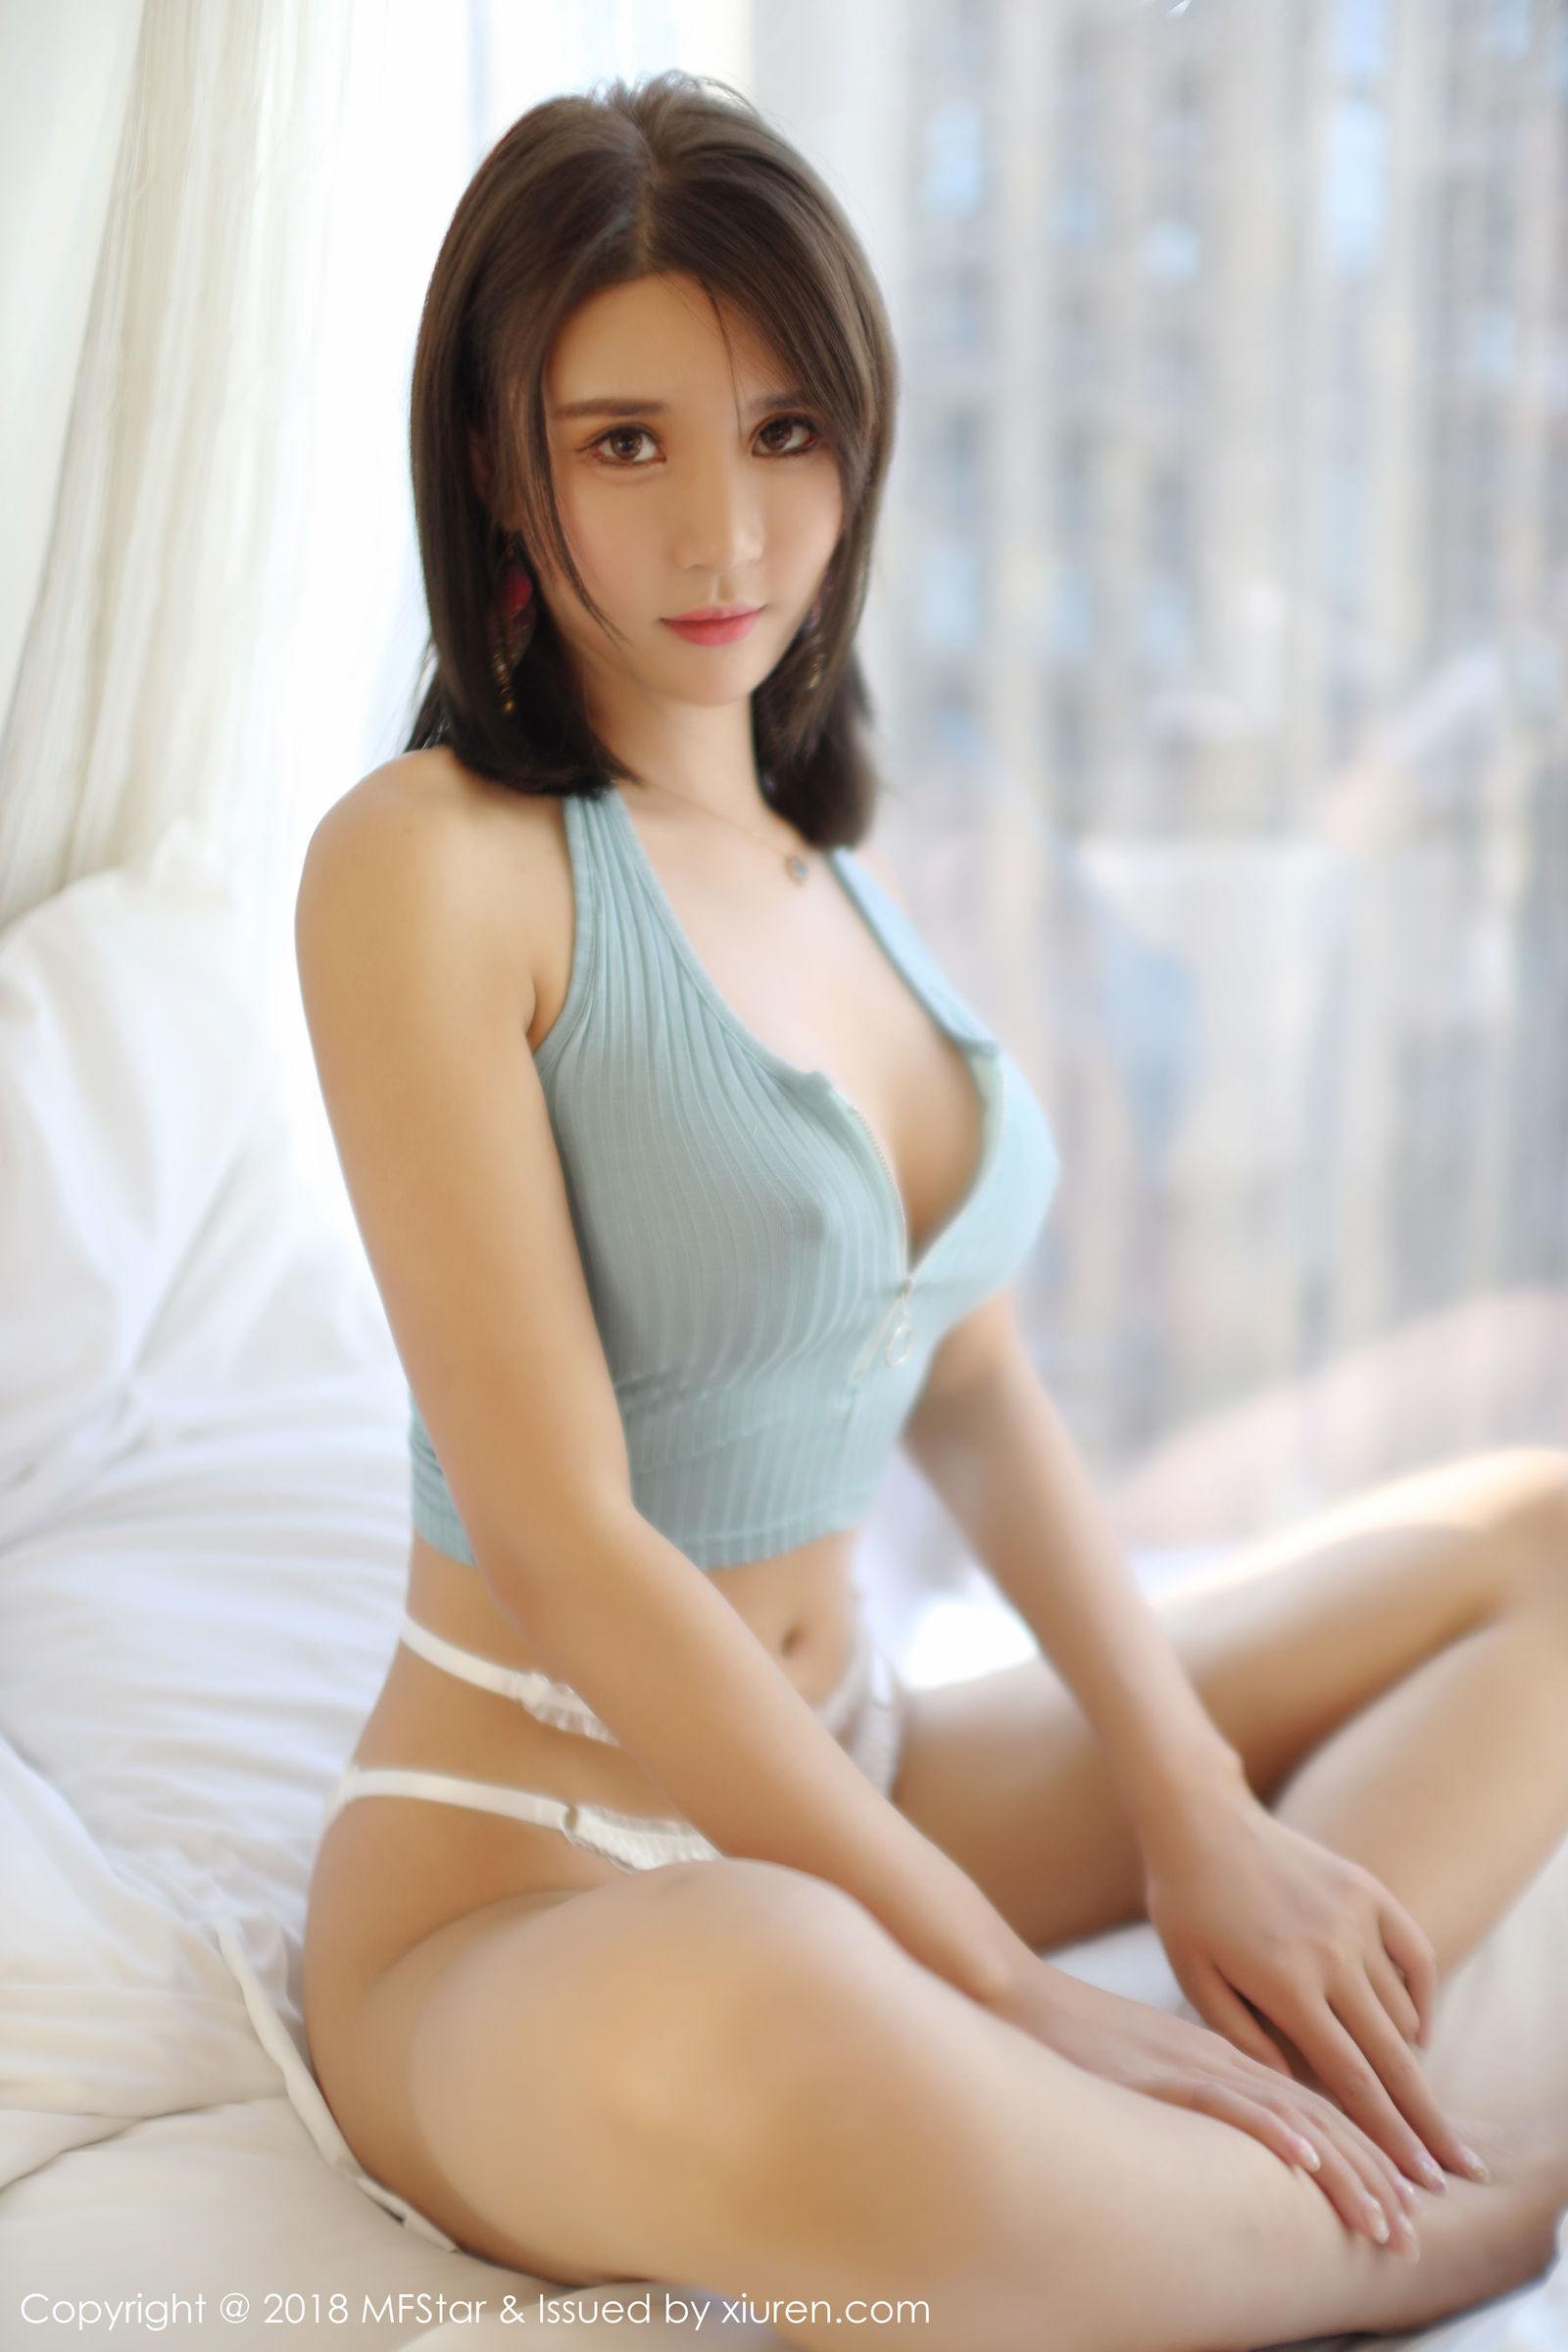 [MFStar模范学院] Vol.158 女神@SOLO-尹菲魅惑私房丝袜美图[38P]